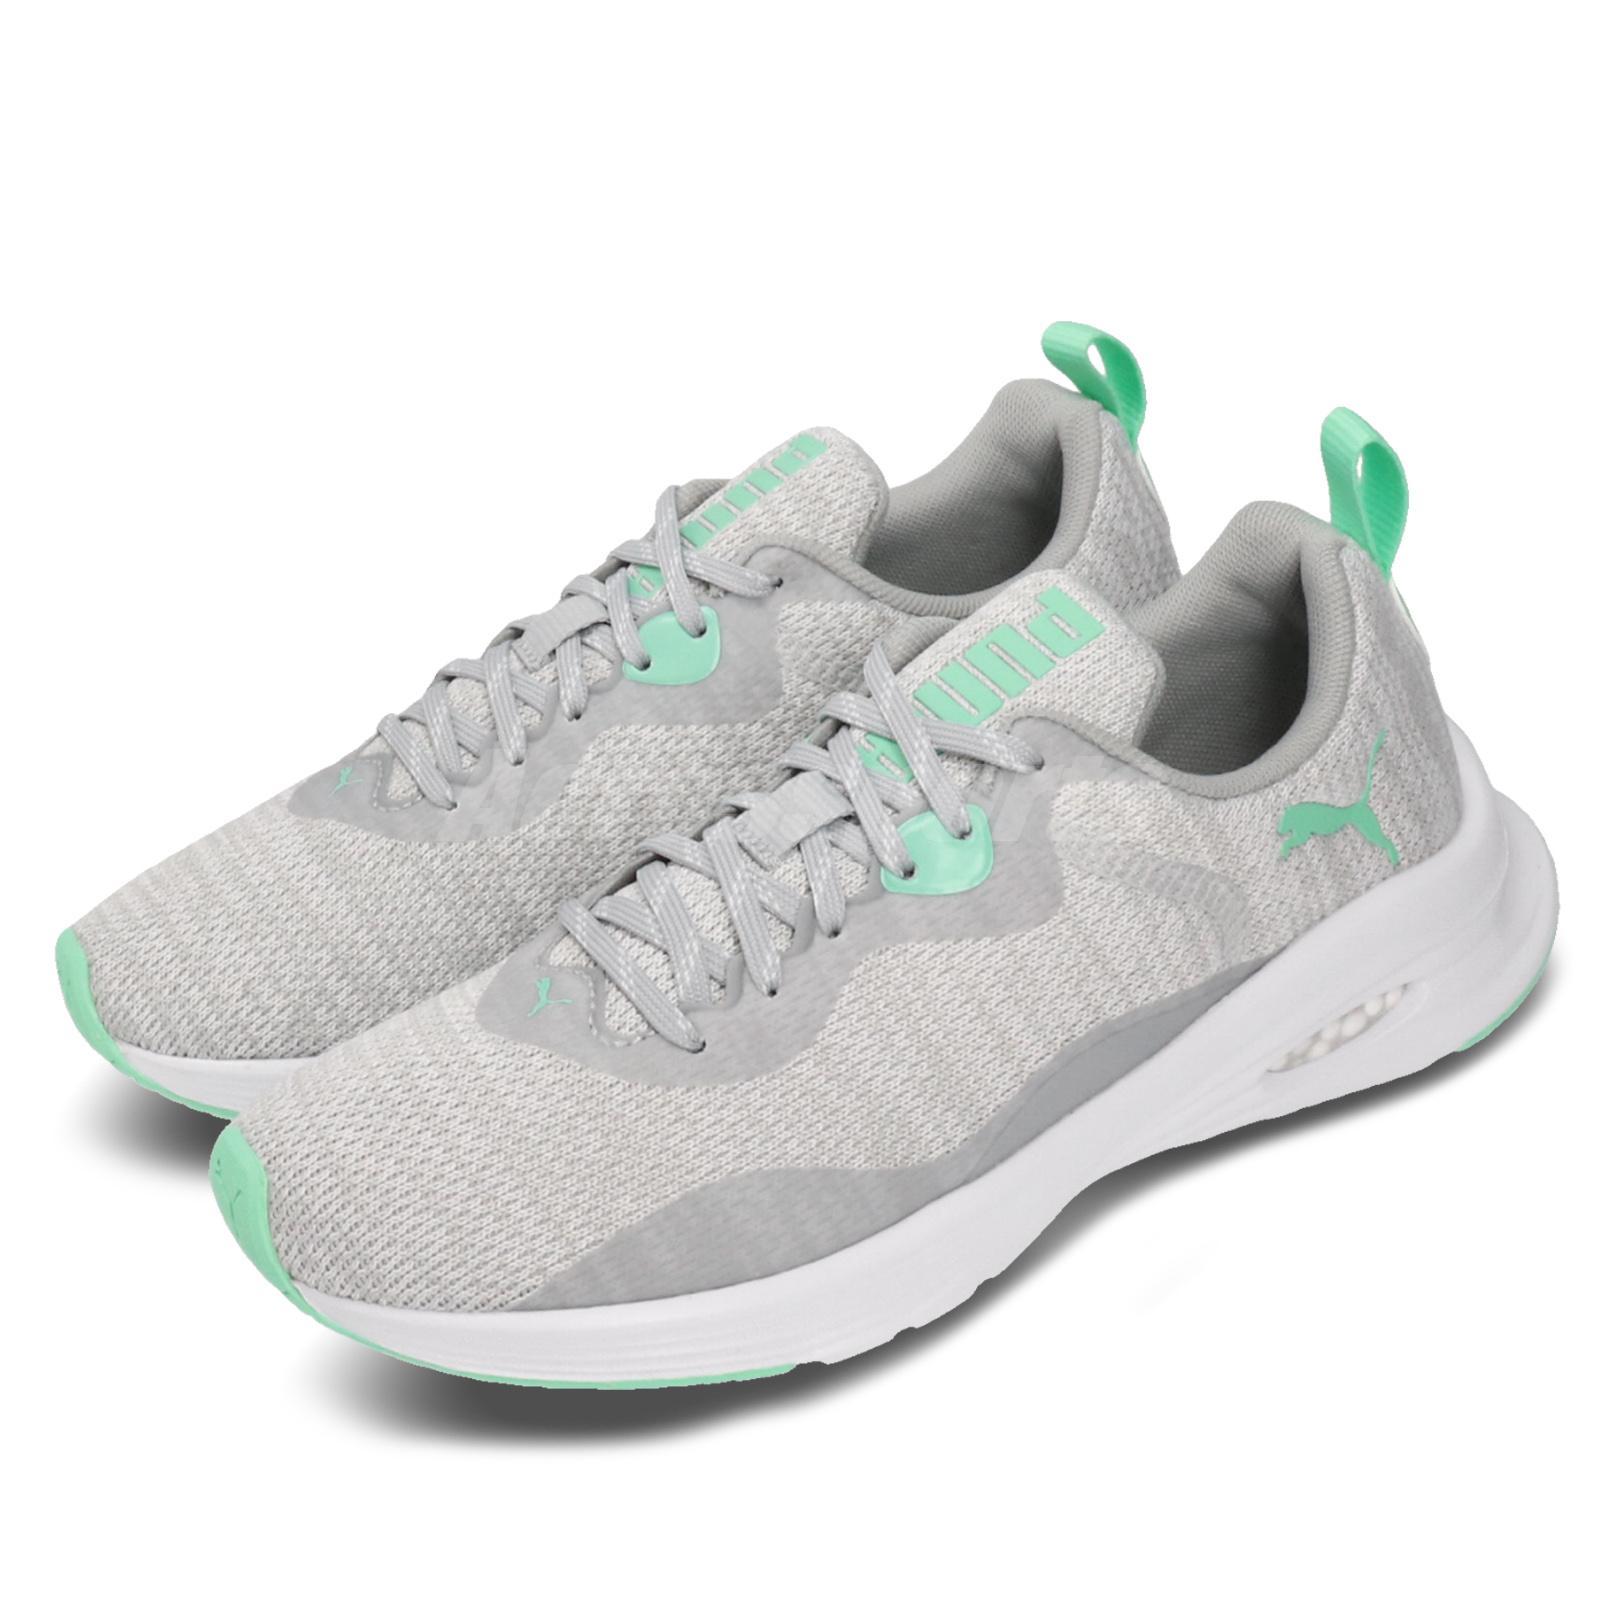 Details about Puma Hybrid Fuego Knit Wns Grey Green White Women Running  Shoe Sneaker 192957-05